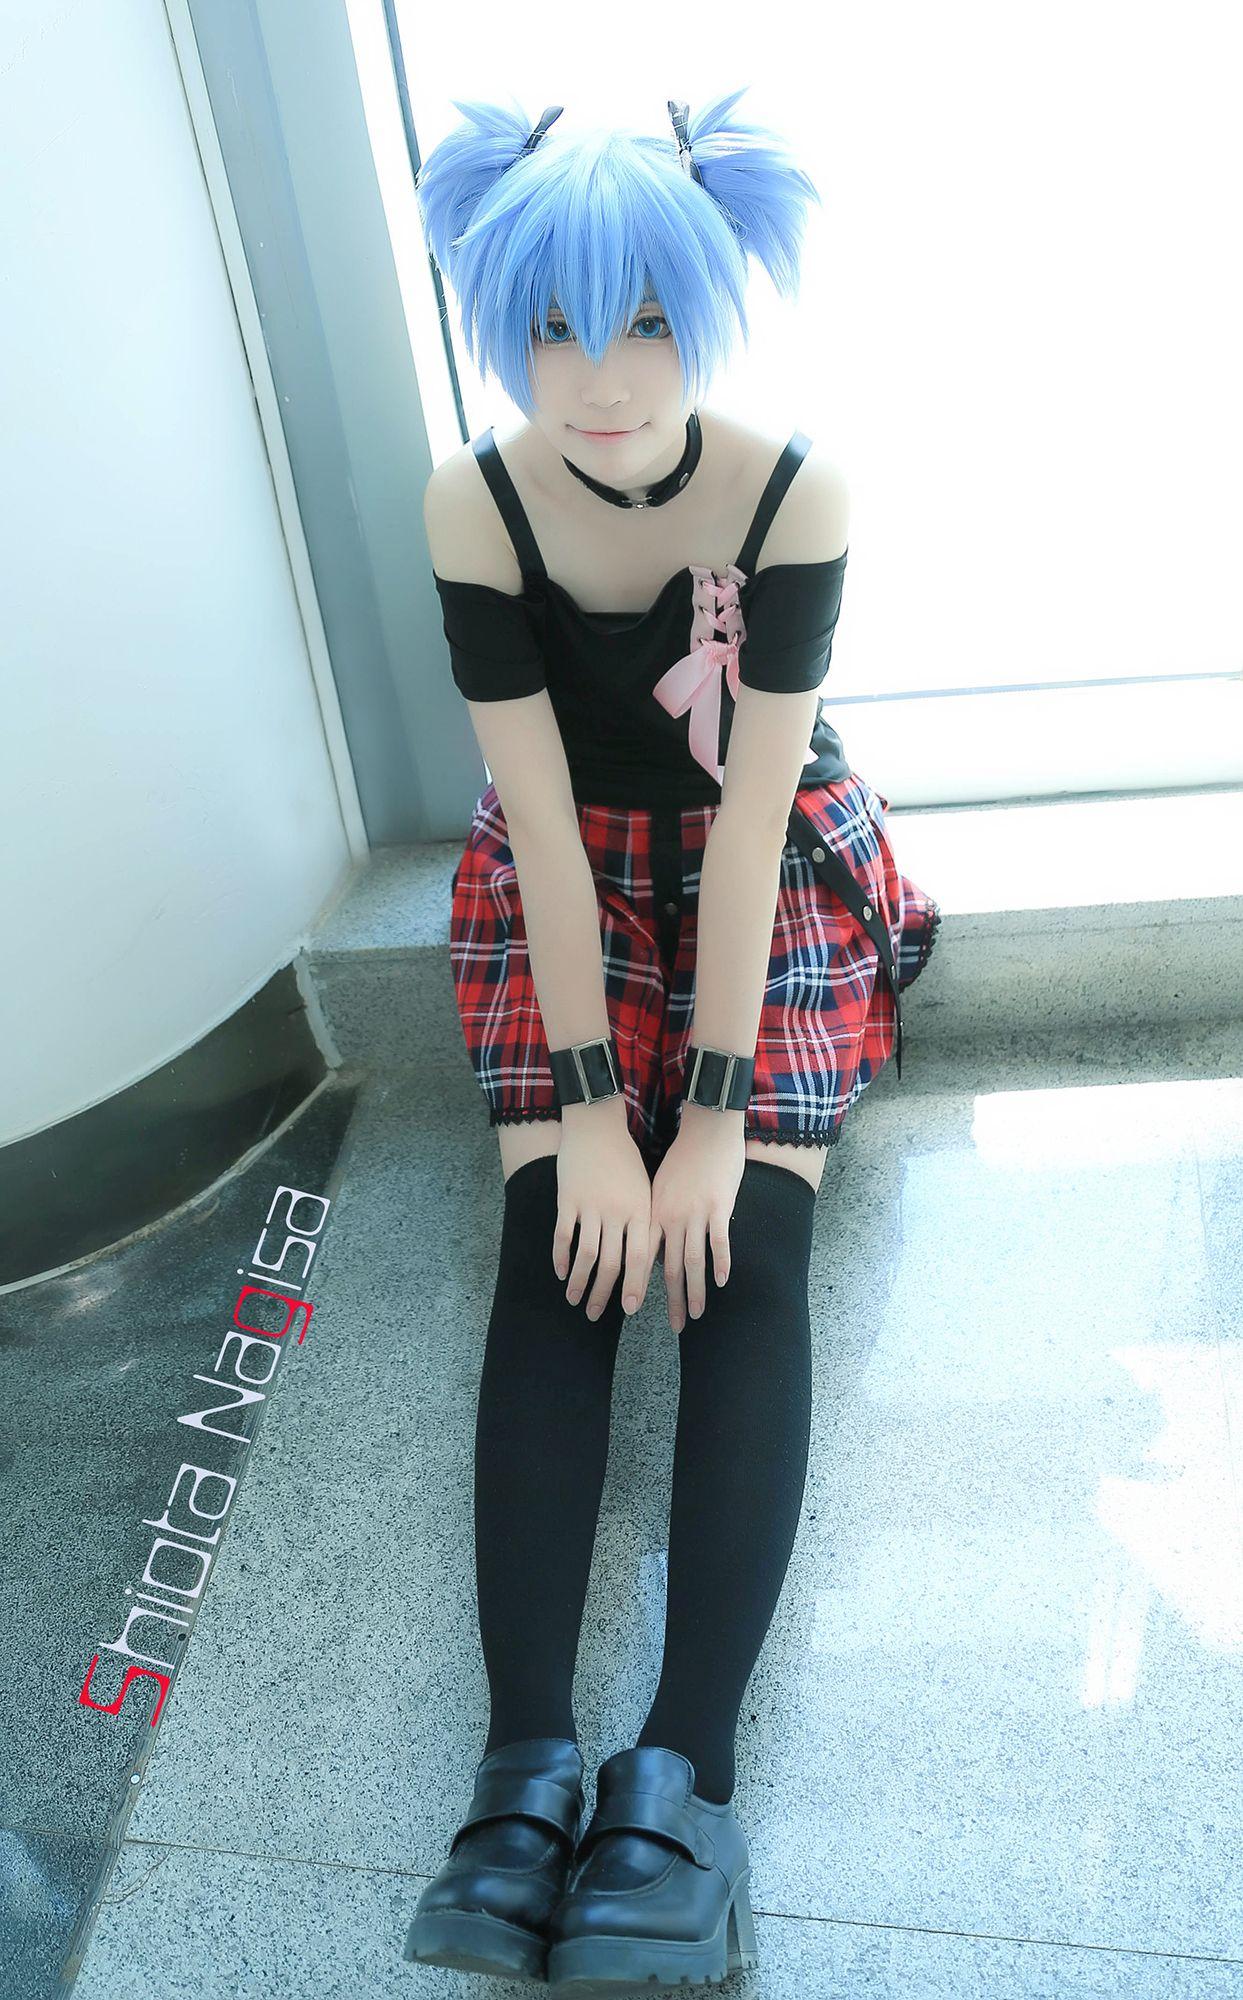 Lanxuan27 兰轩 Nagisa Shiota Cosplay Photo Cure Worldcosplay